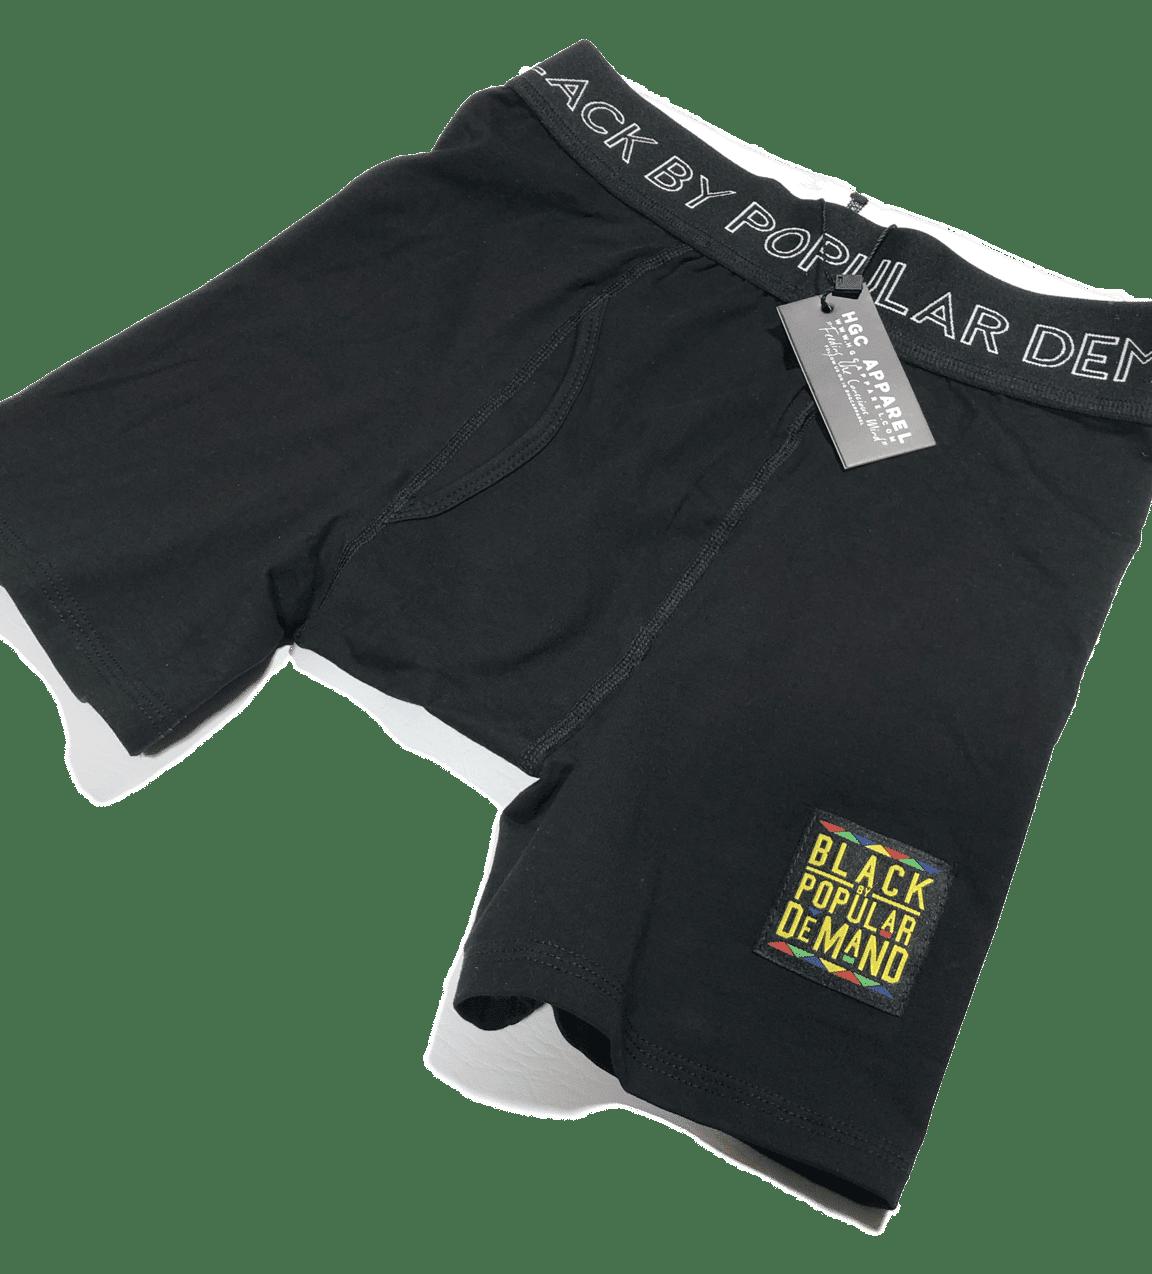 BLACK BY POPULAR DEMAND® Black Boxer Briefs HGC Apparel